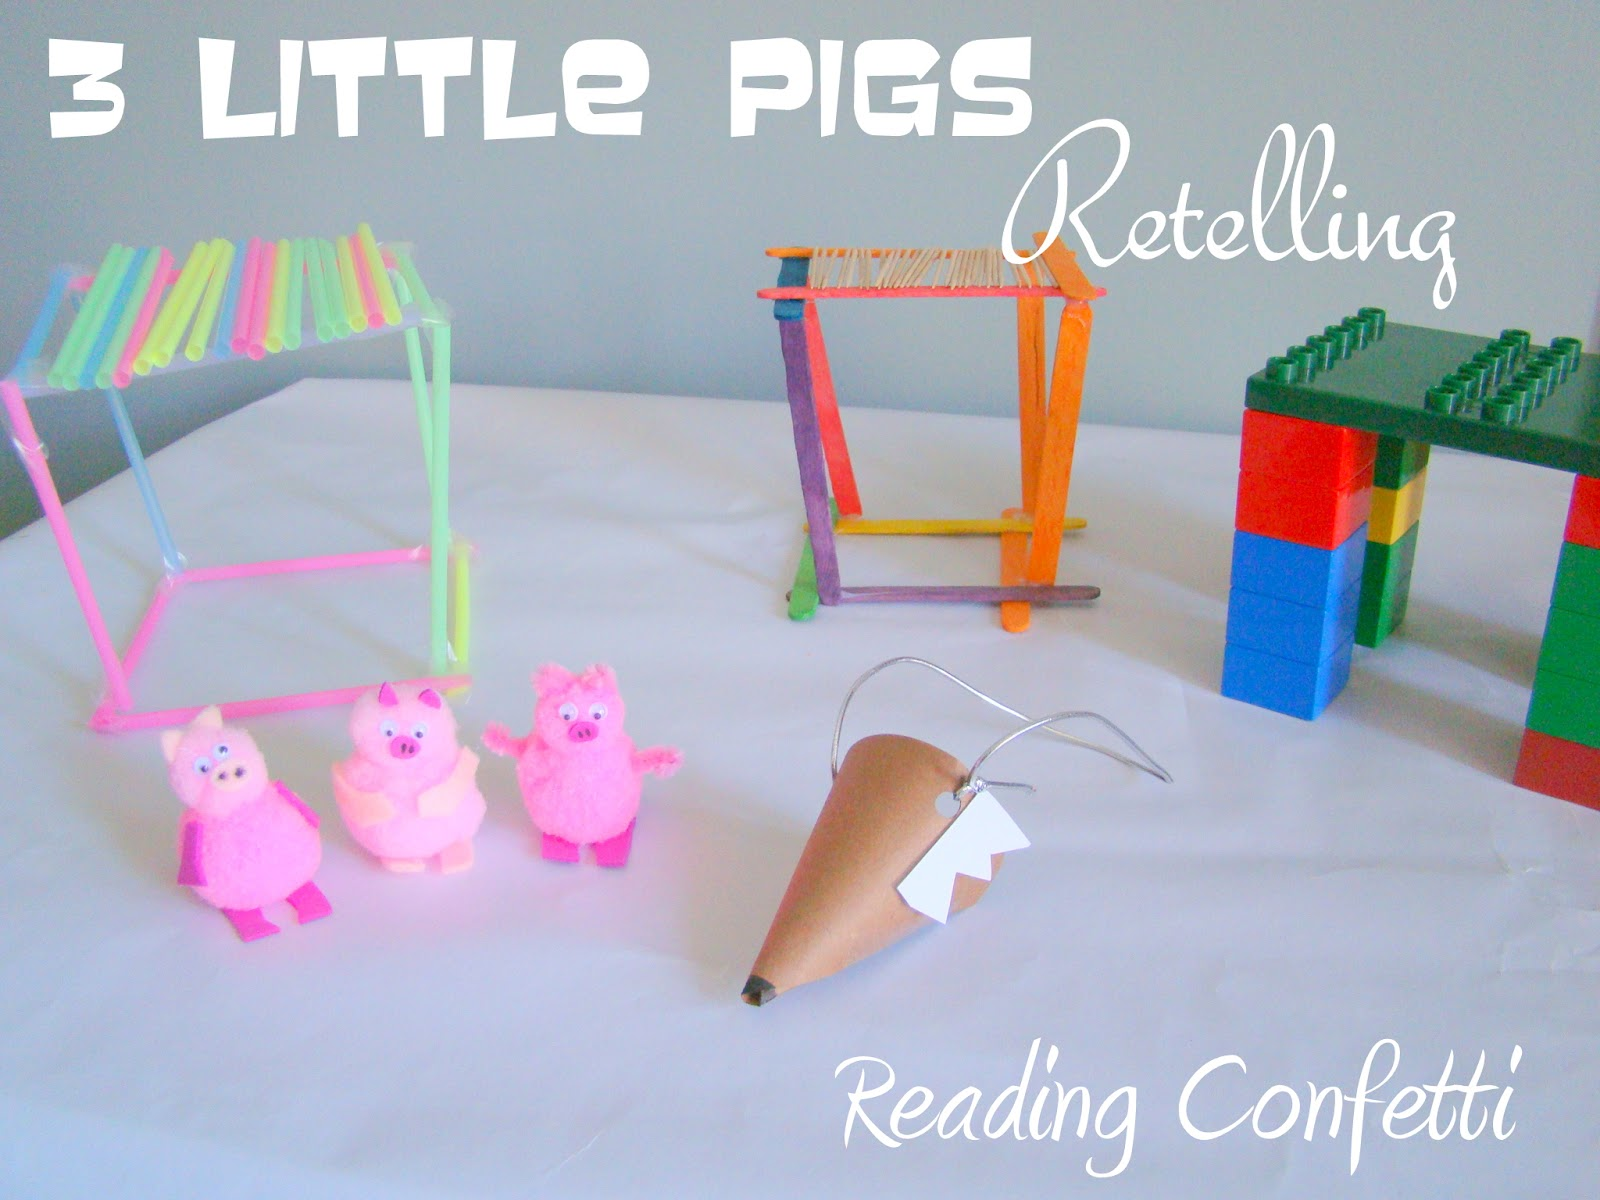 The 3 Little Pigs Retelling Reading Confetti